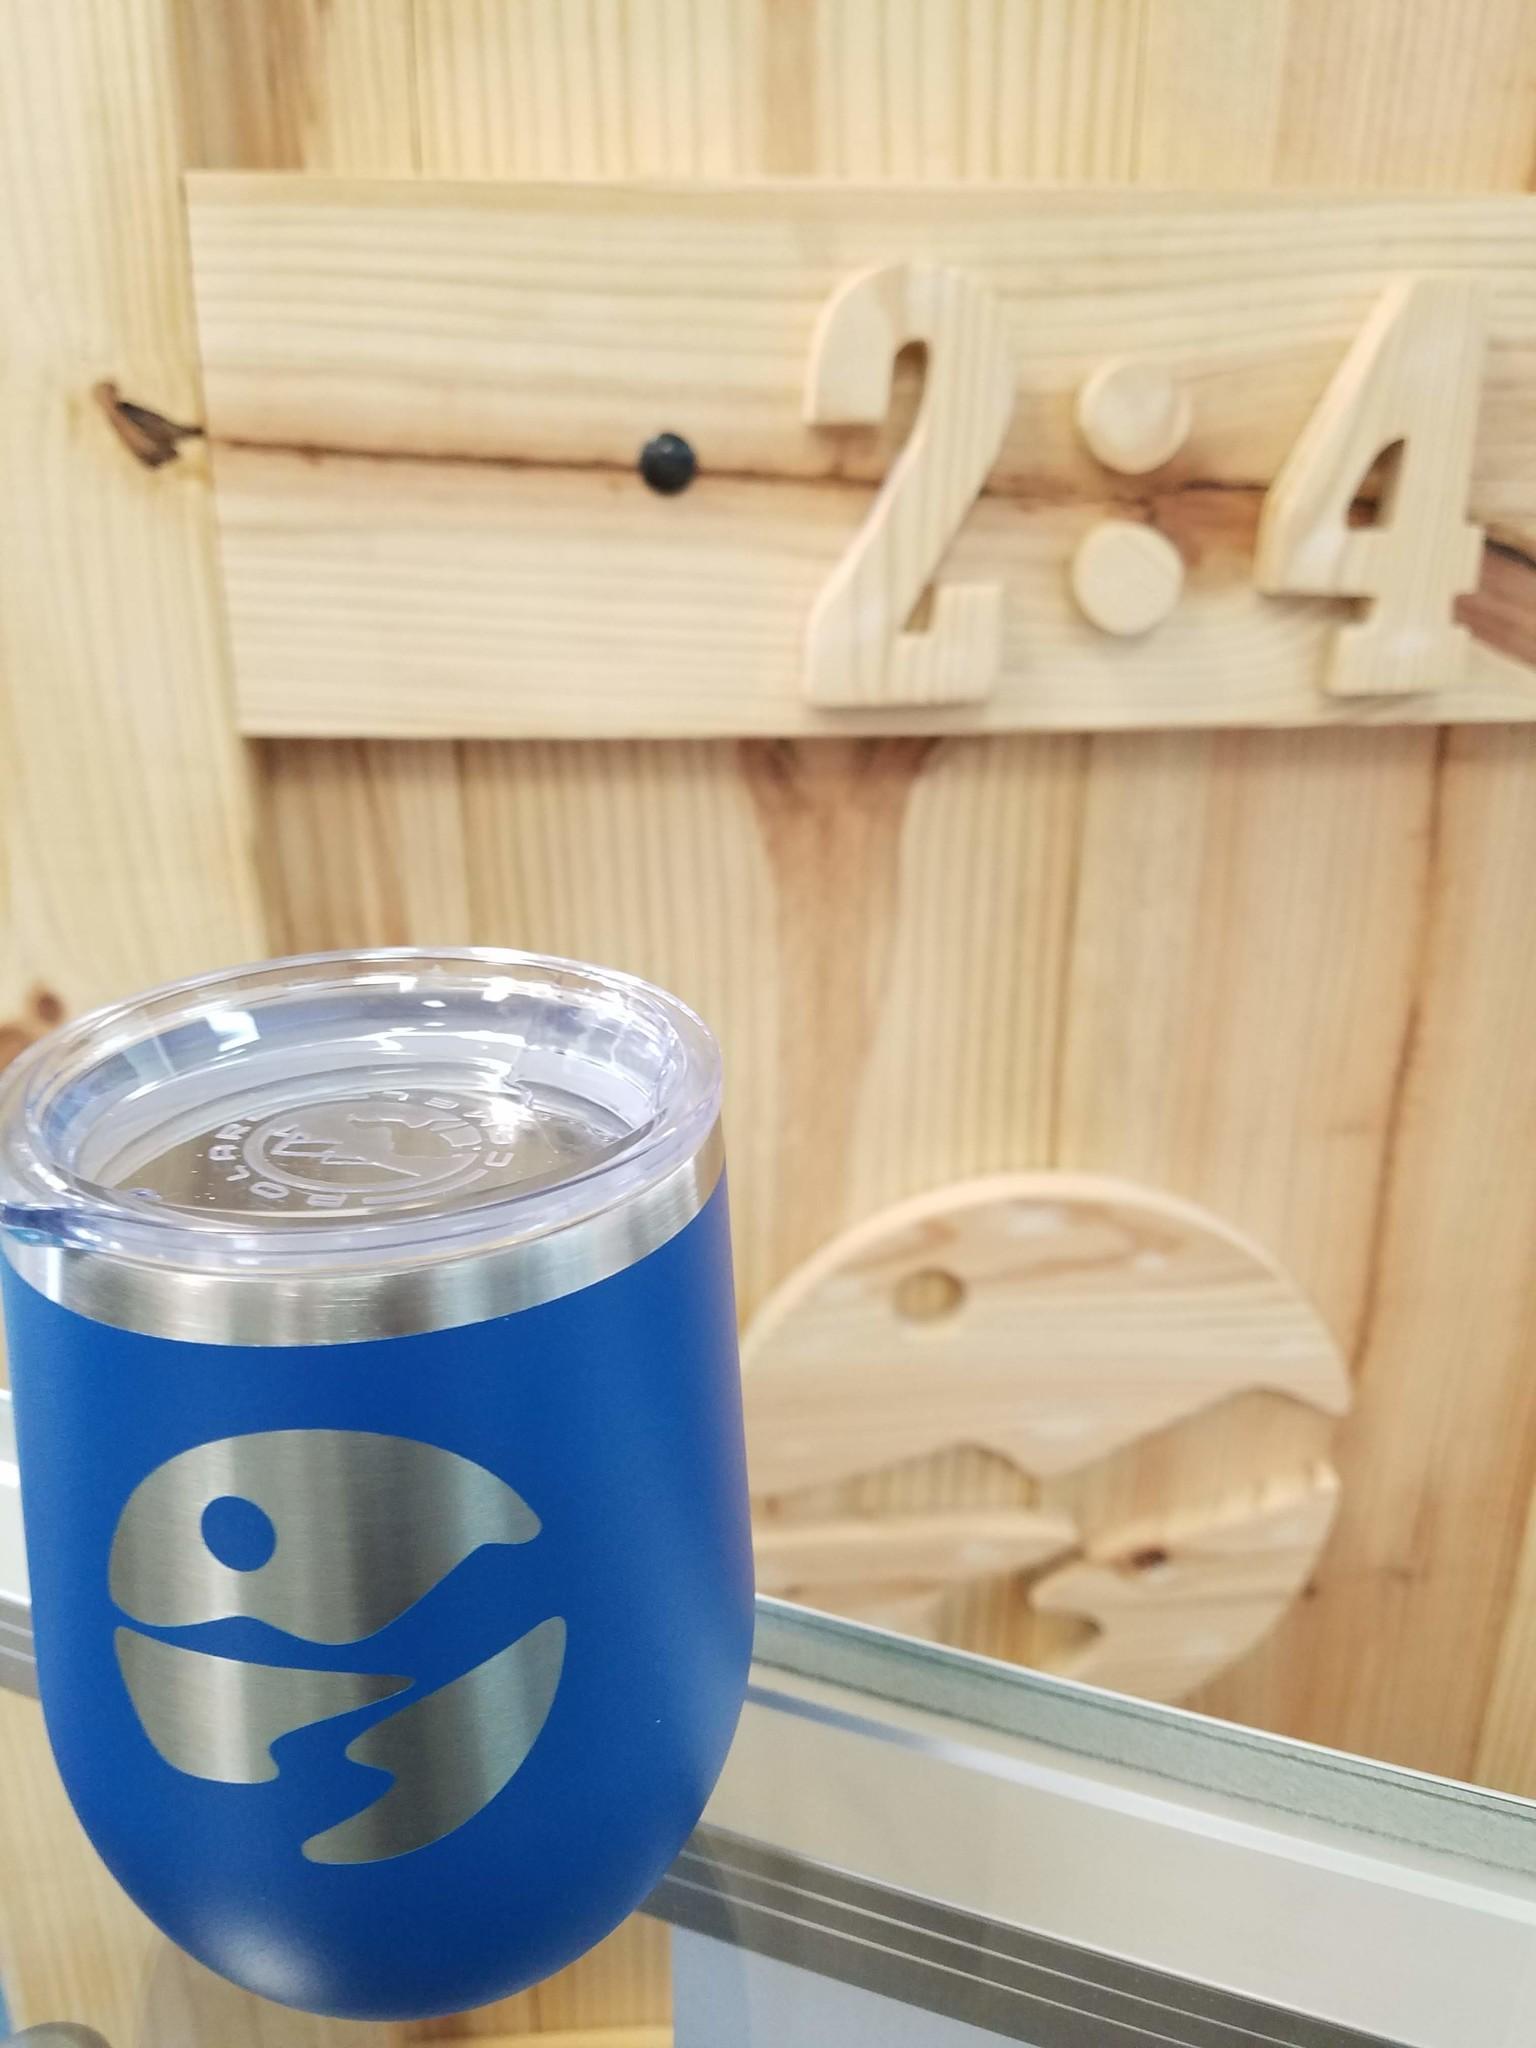 H2:4 CUSTOM BAITS H2:4 Stemless Wineglass Mug